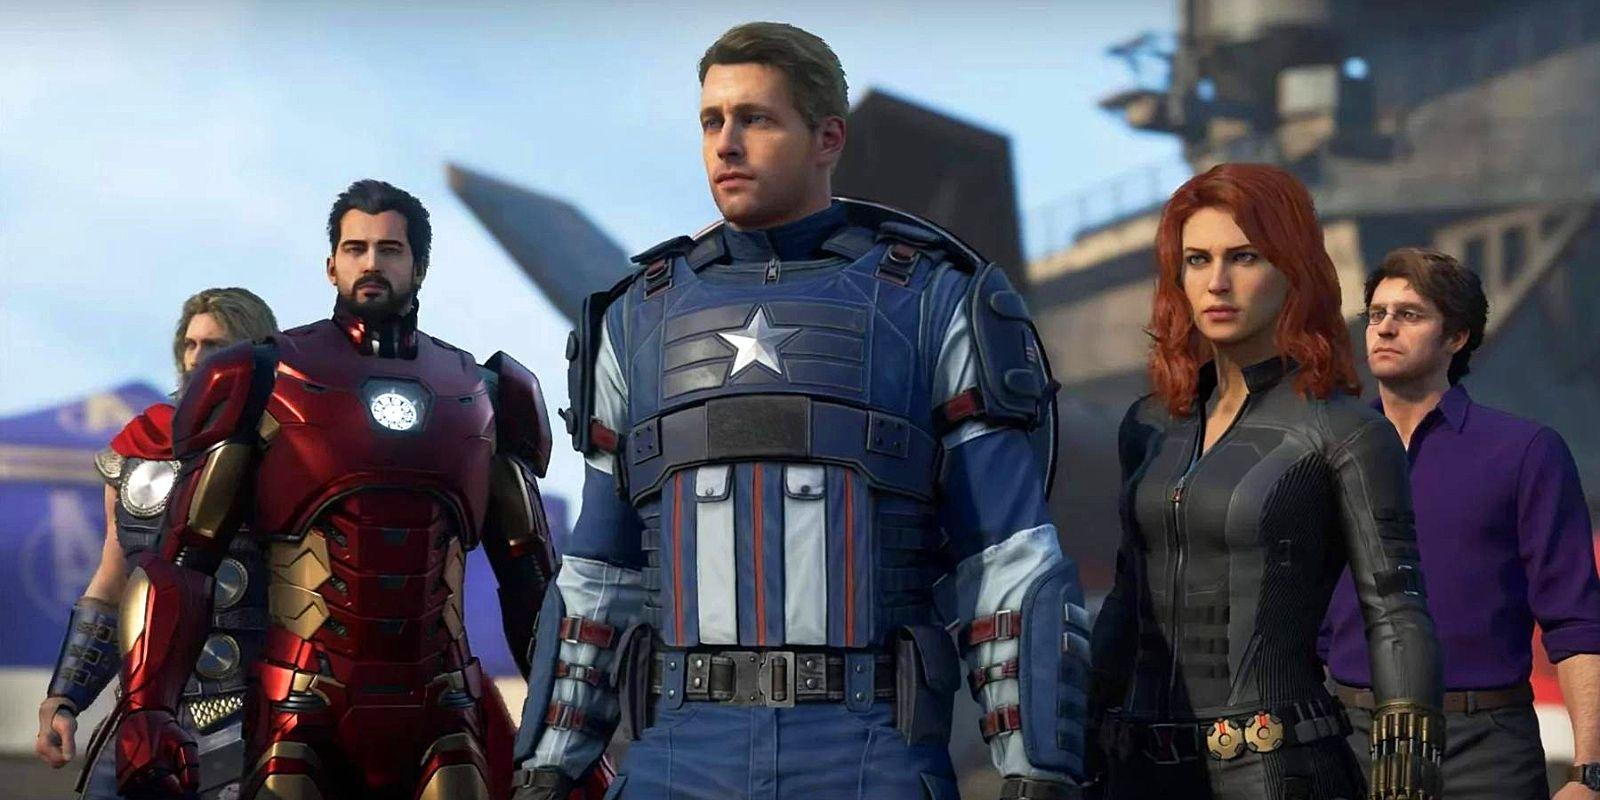 Marvel's Avengers Most BROKEN Character Is... [SPOILER]